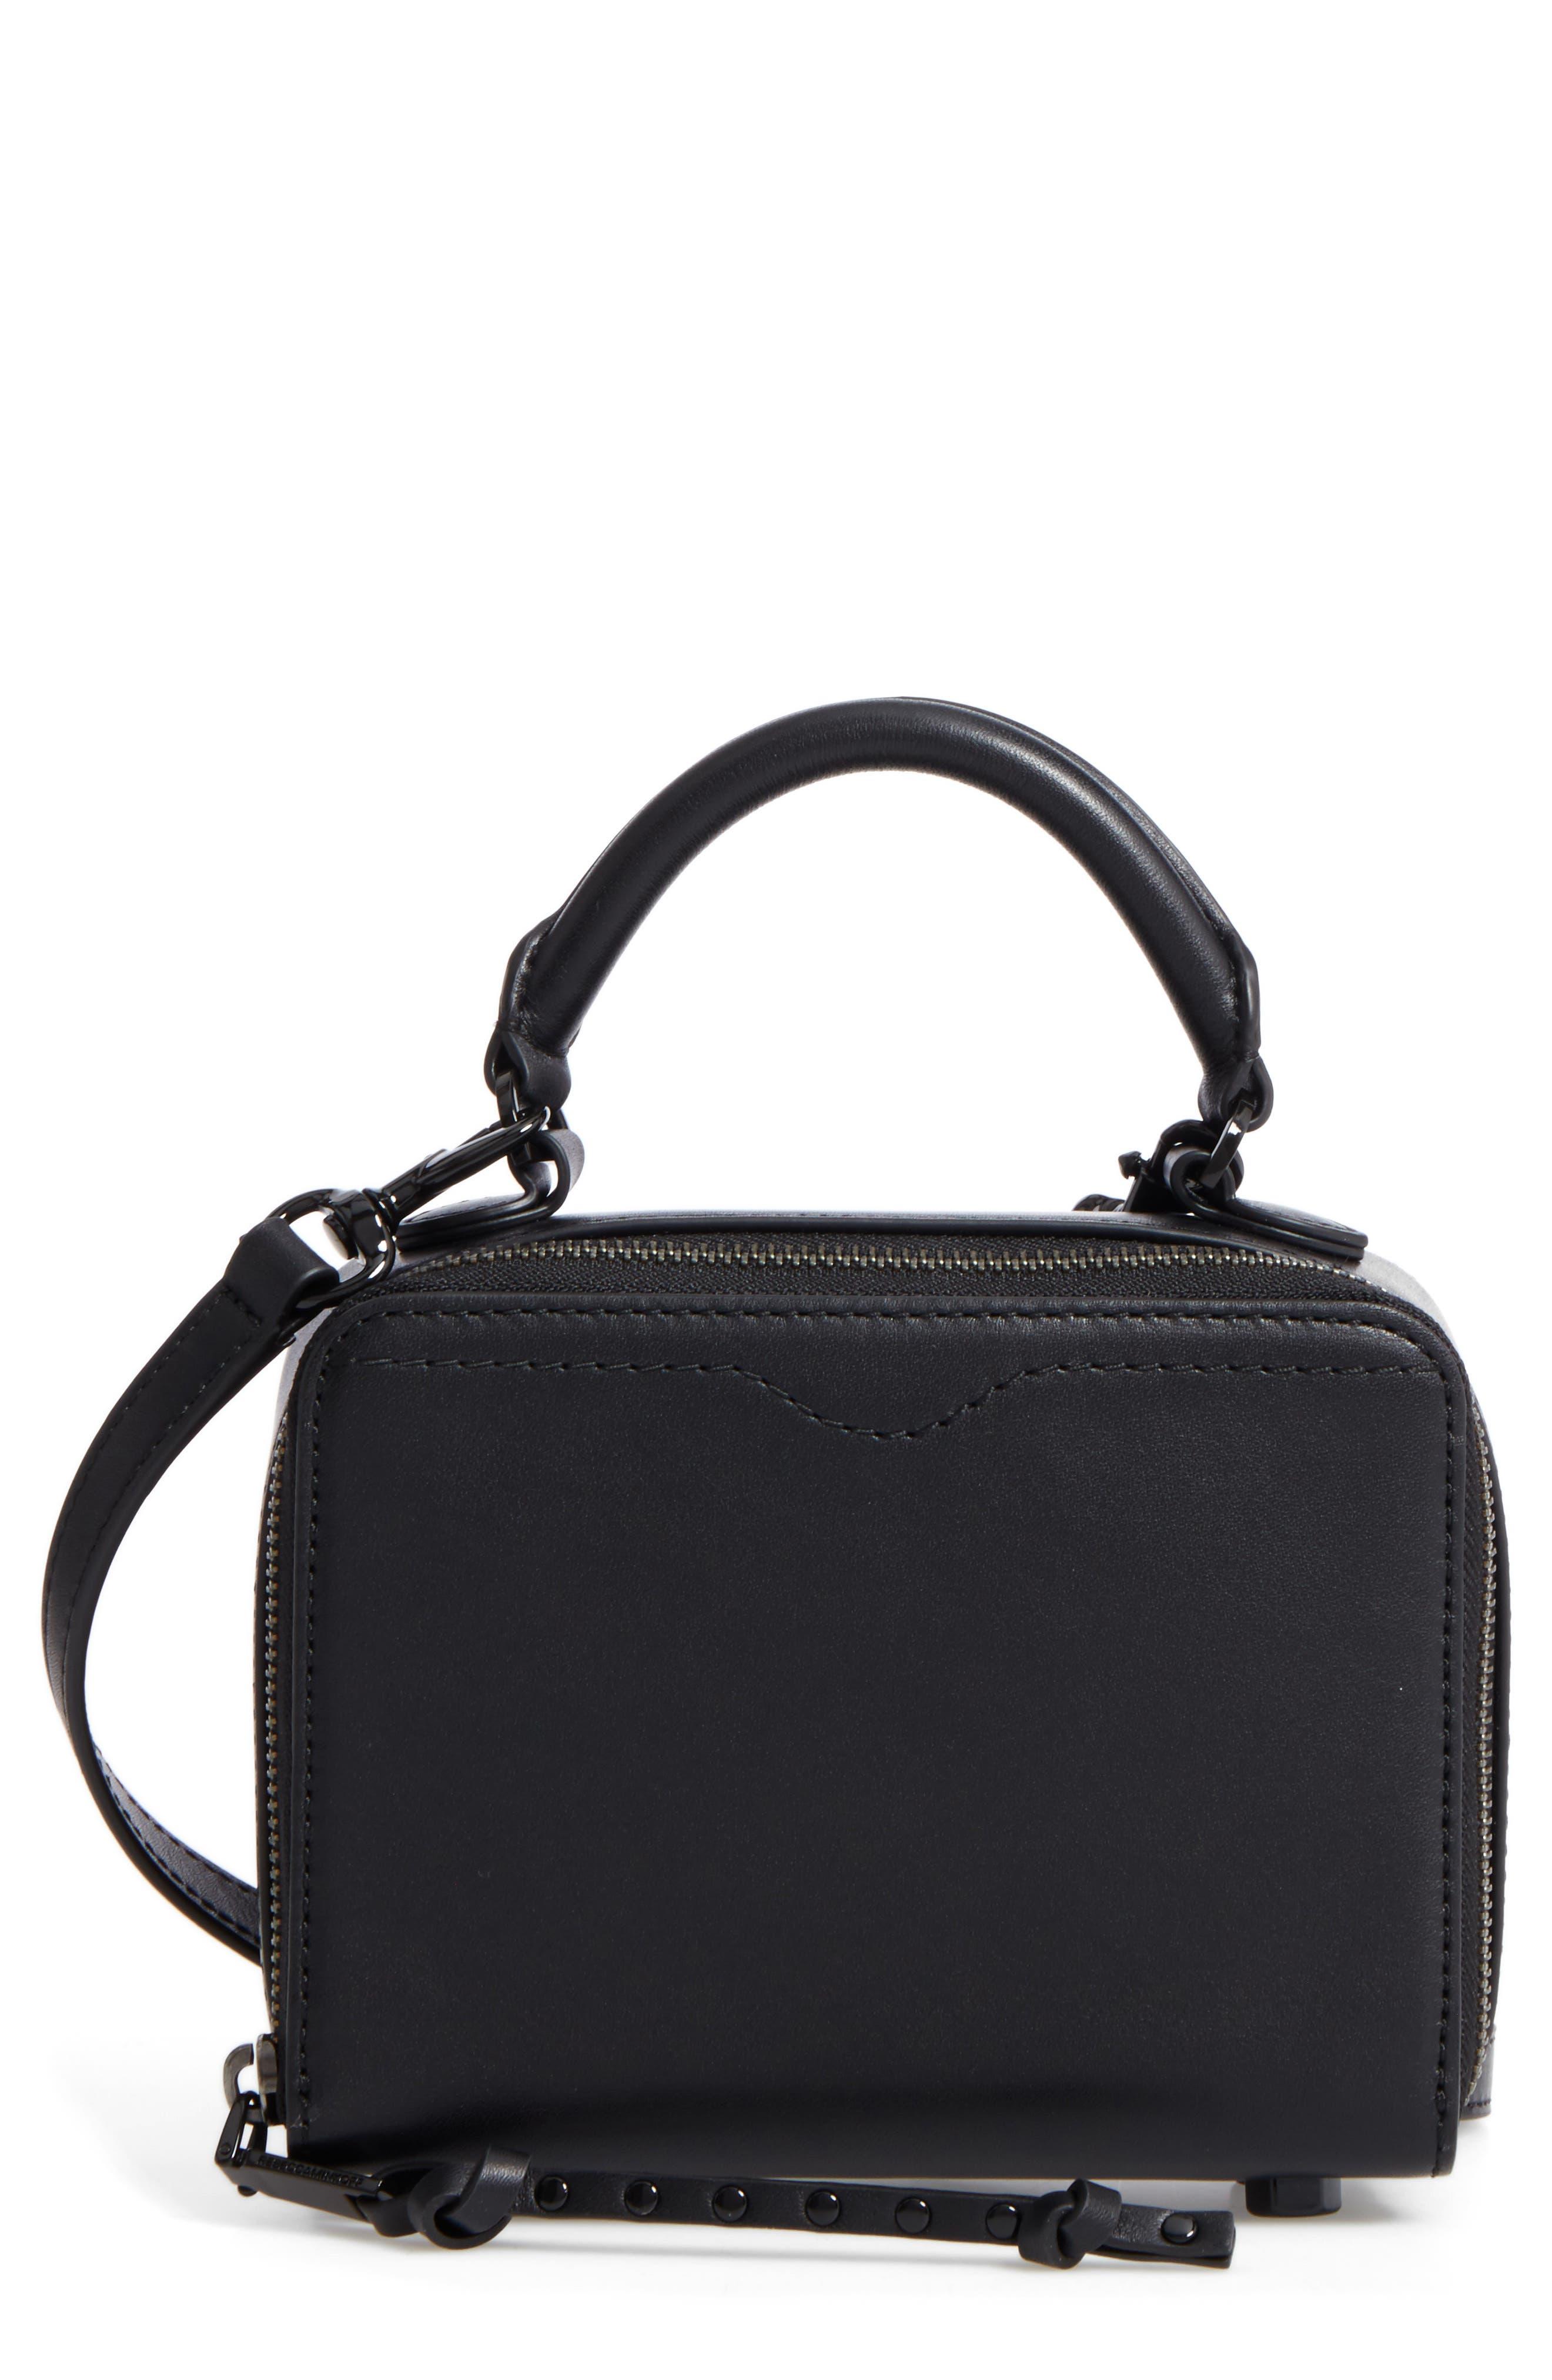 REBECCA MINKOFF Box Leather Crossbody Bag